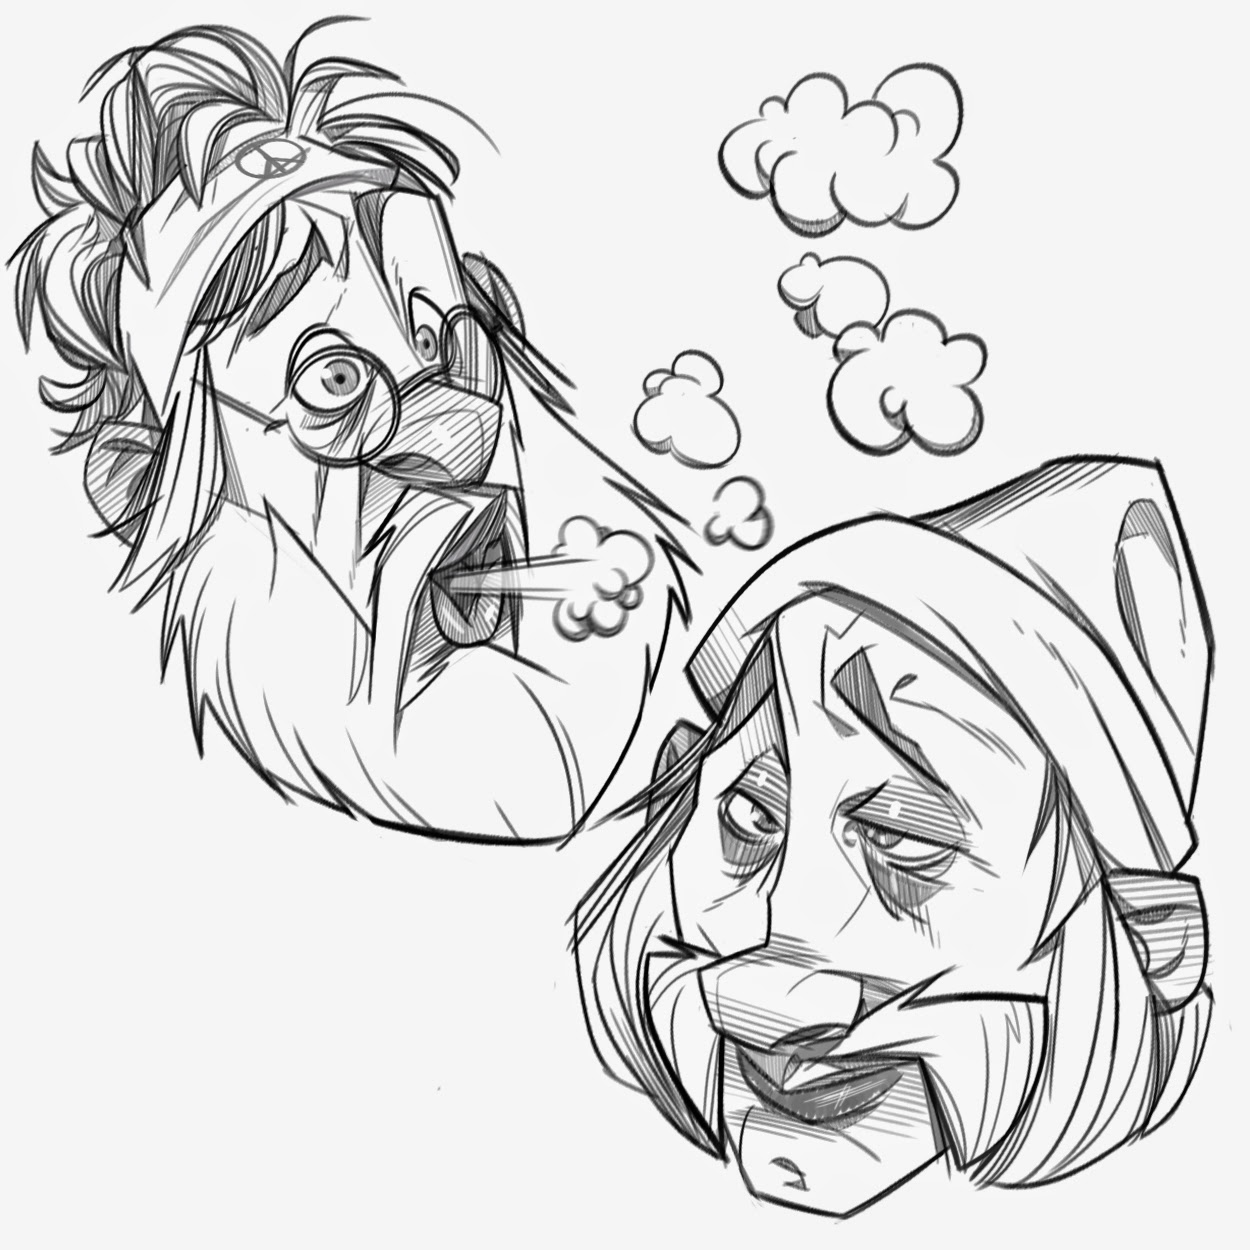 P.Cohen Sketch Blog: Cheech and Chong for Sketch Dailies